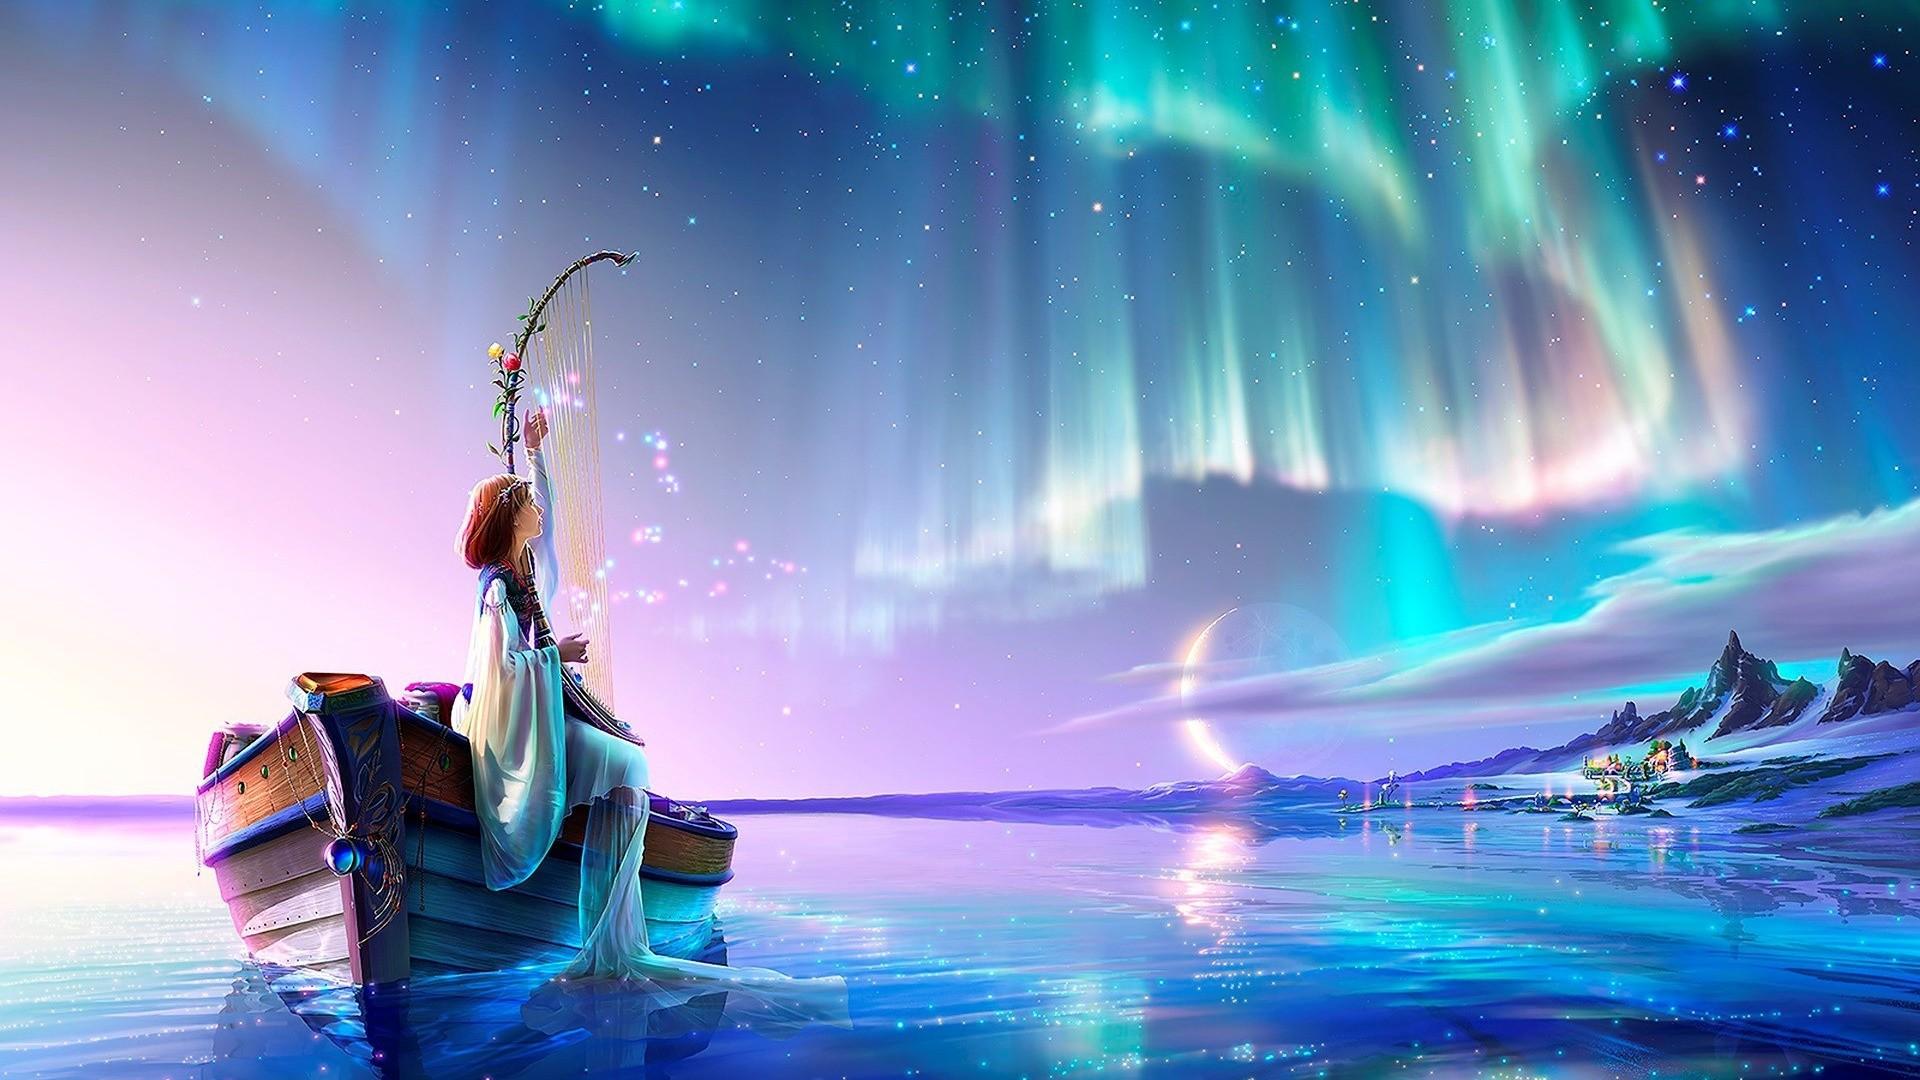 Celestial Wallpaper image hd